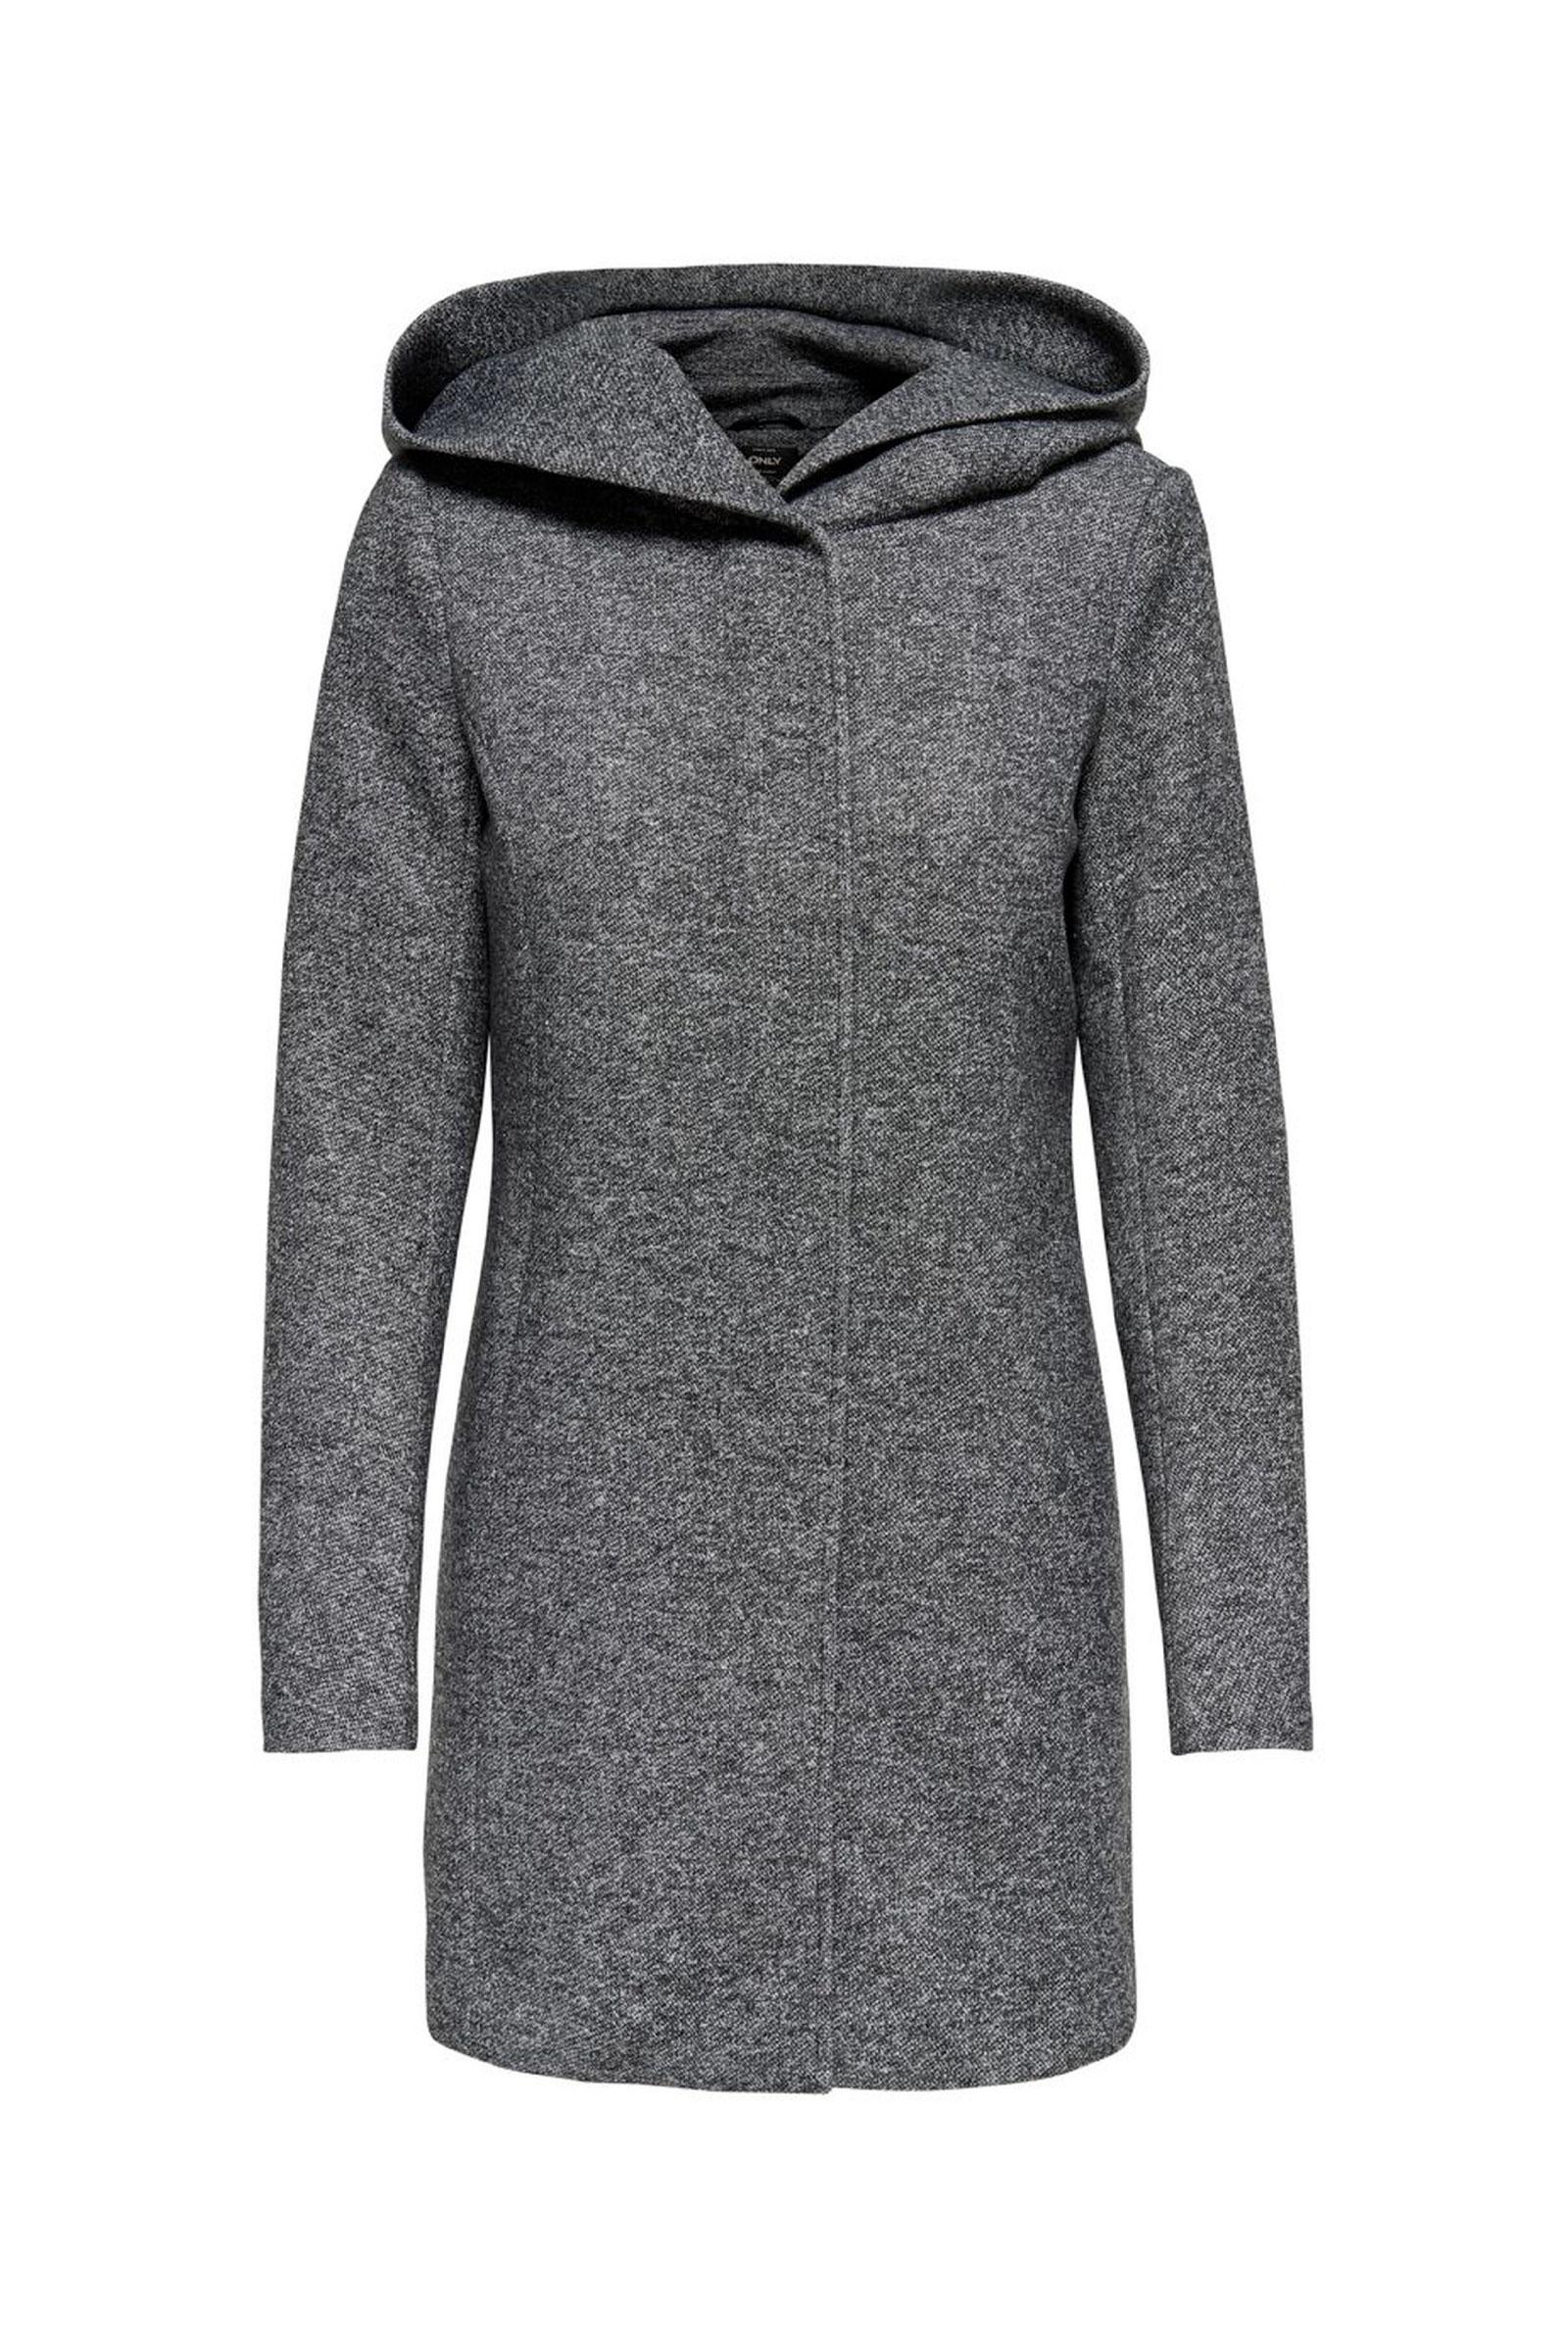 ONLY | Coat | 15142911Dark Grey Melange